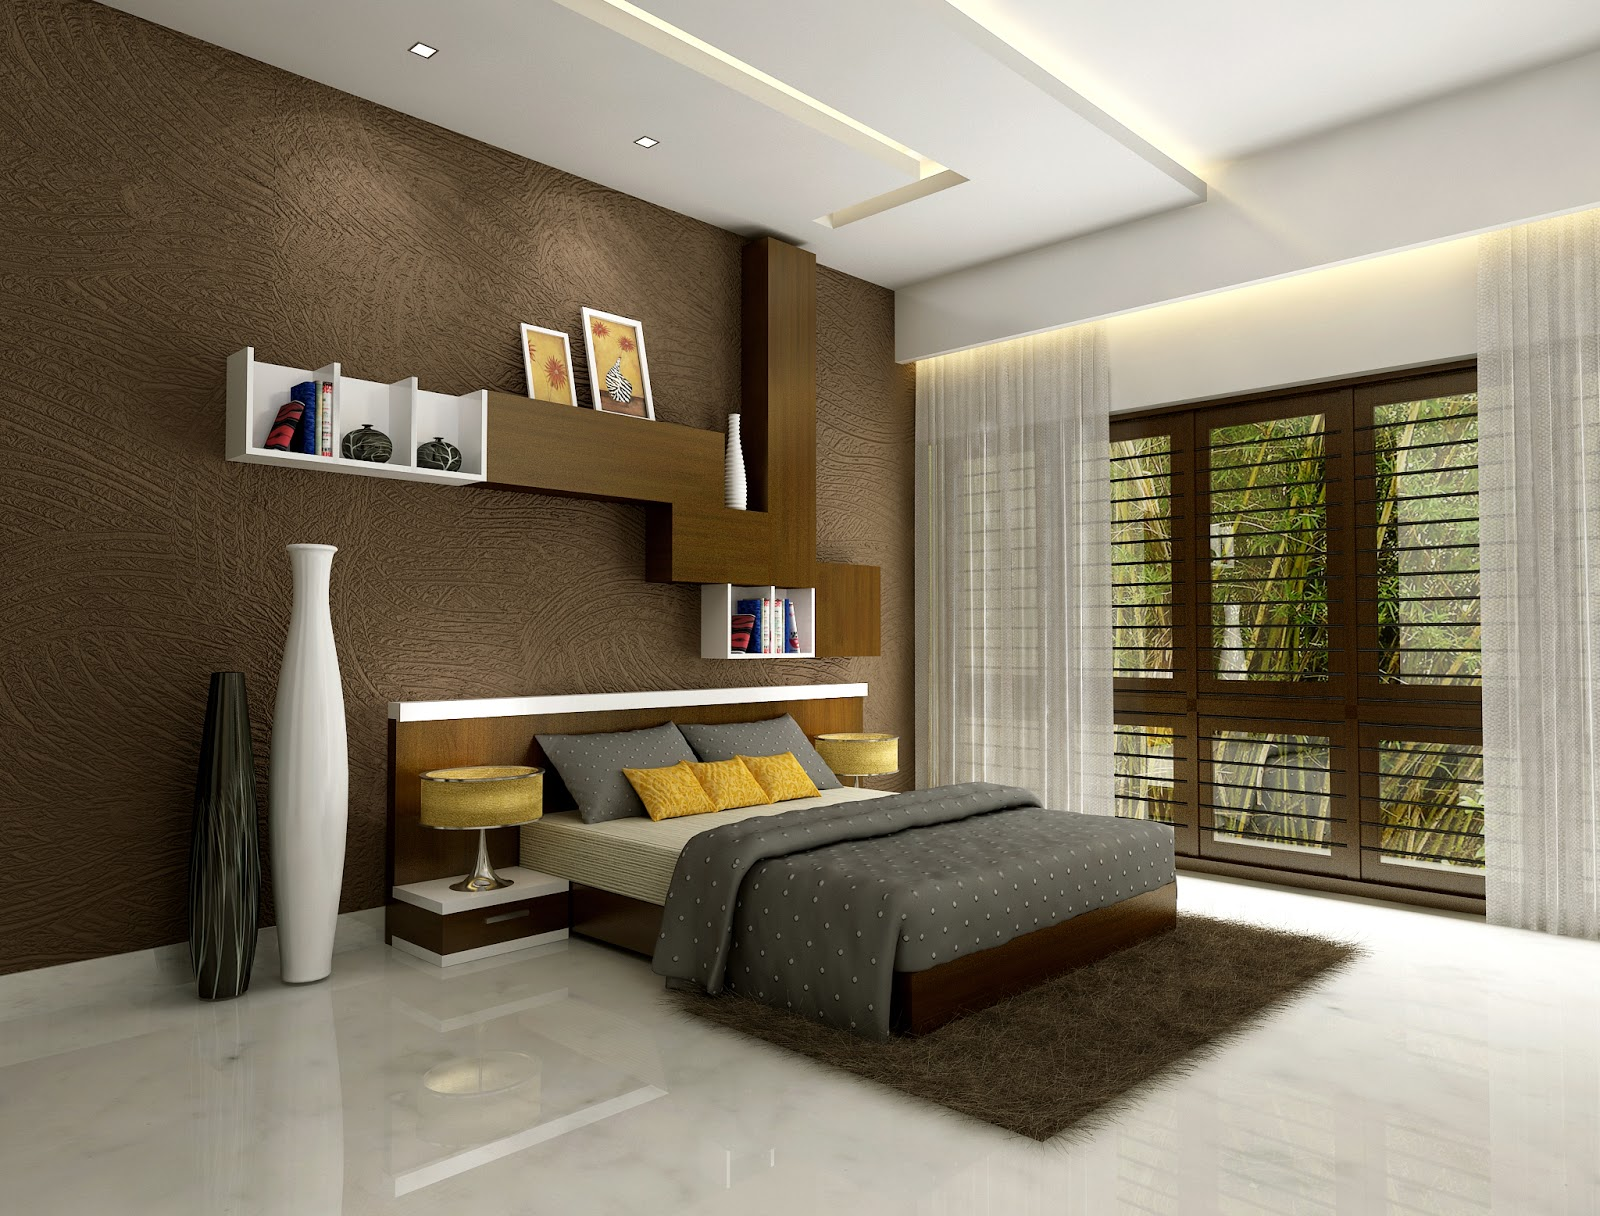 interior design for living room in kerala | living room